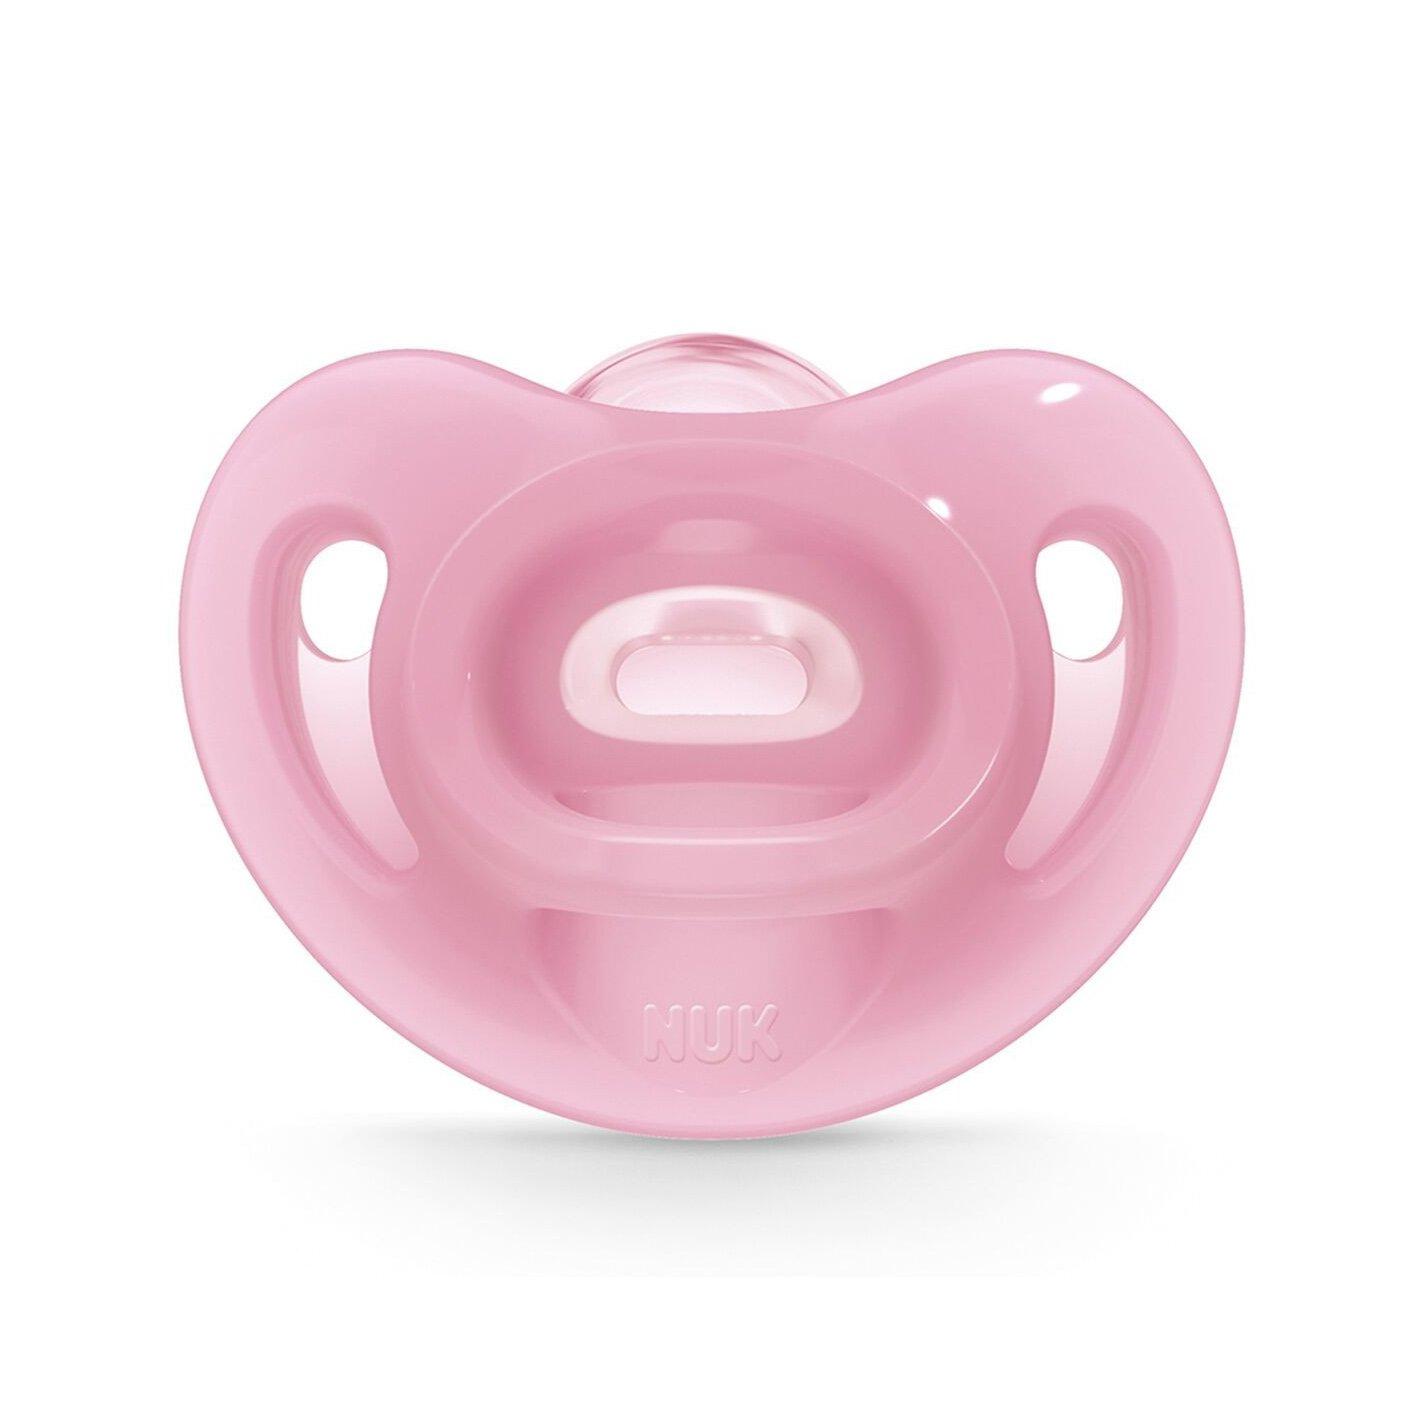 Nuk Sensitive Πιπίλα Όλο Σιλικόνη Εξαιρετικά Μαλακή & Εύκαμπτη 1 Τεμάχιο – 0-6 Μηνών Ροζ